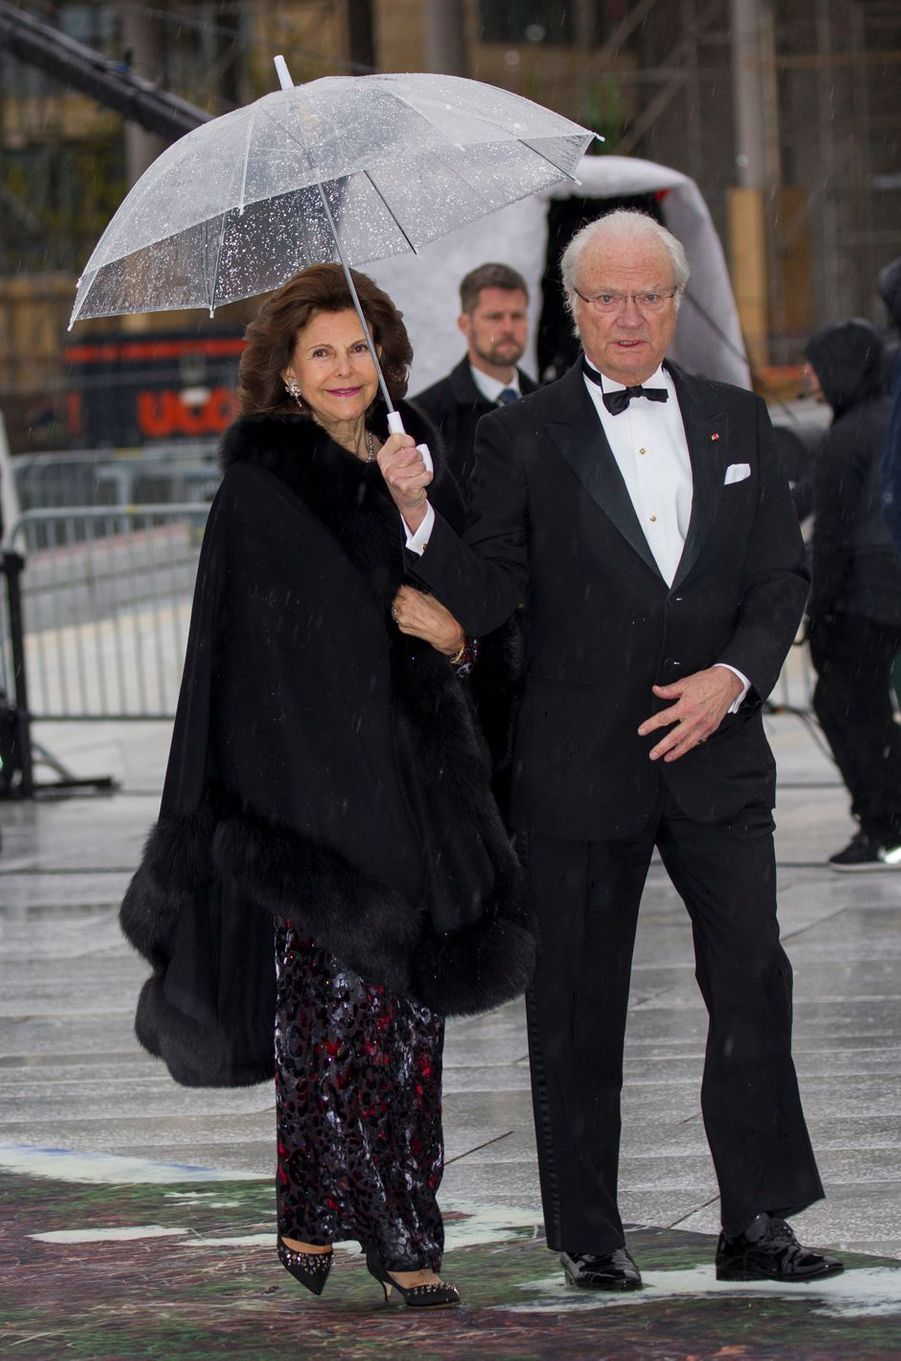 La reine Silvia et le roi Carl XVI Gustaf de Suède à Oslo, le 10 mai 2017